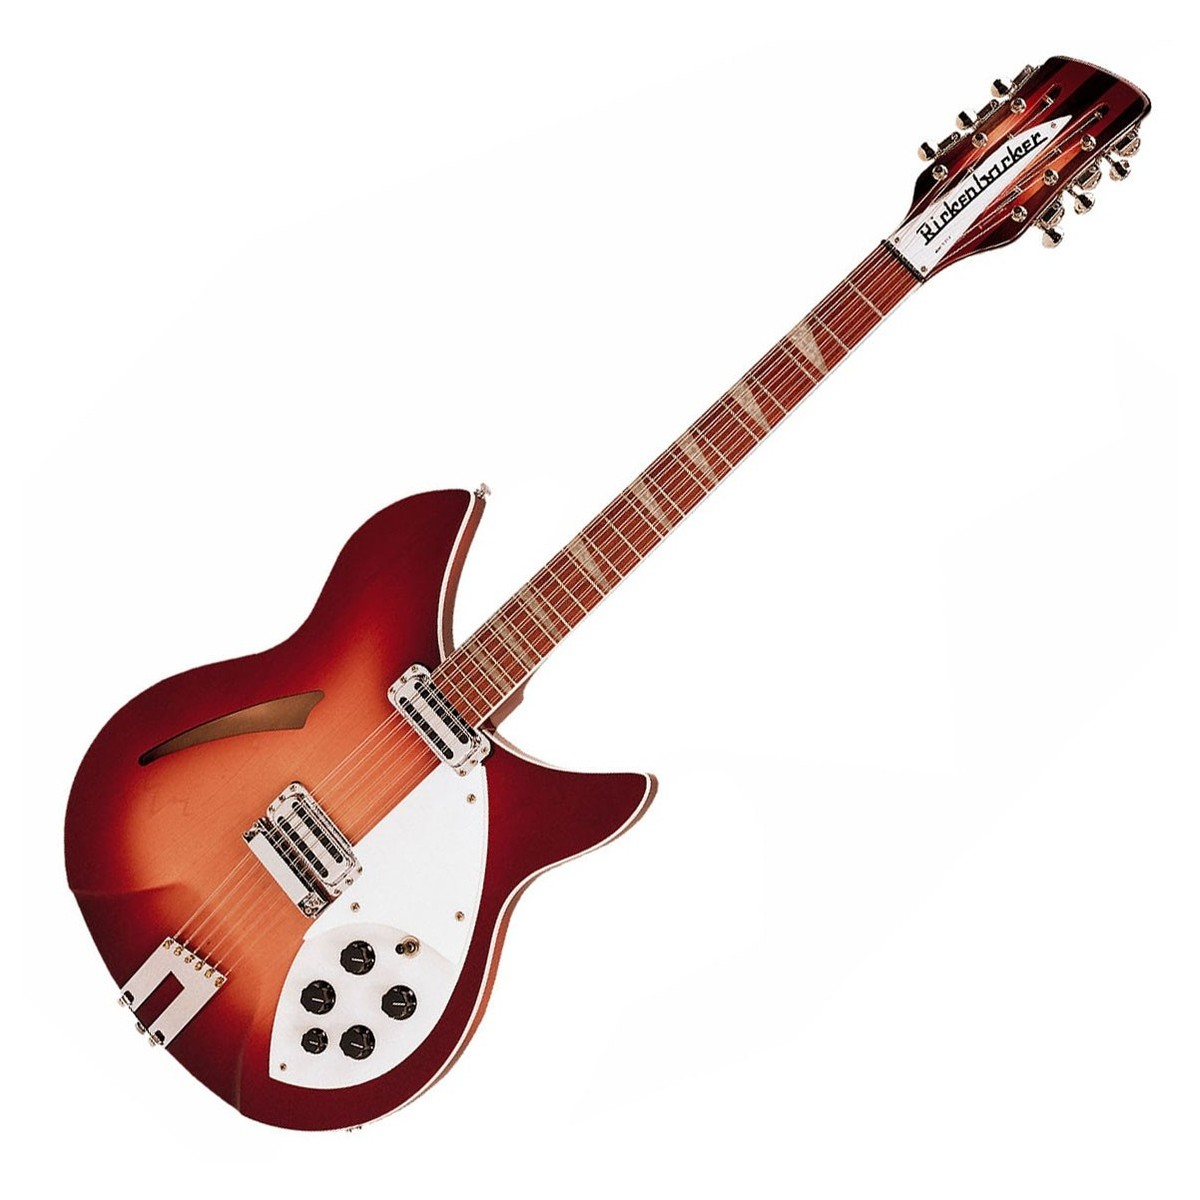 rickenbacker 360 12 c63 12 string guitar fireglo at gear4music. Black Bedroom Furniture Sets. Home Design Ideas